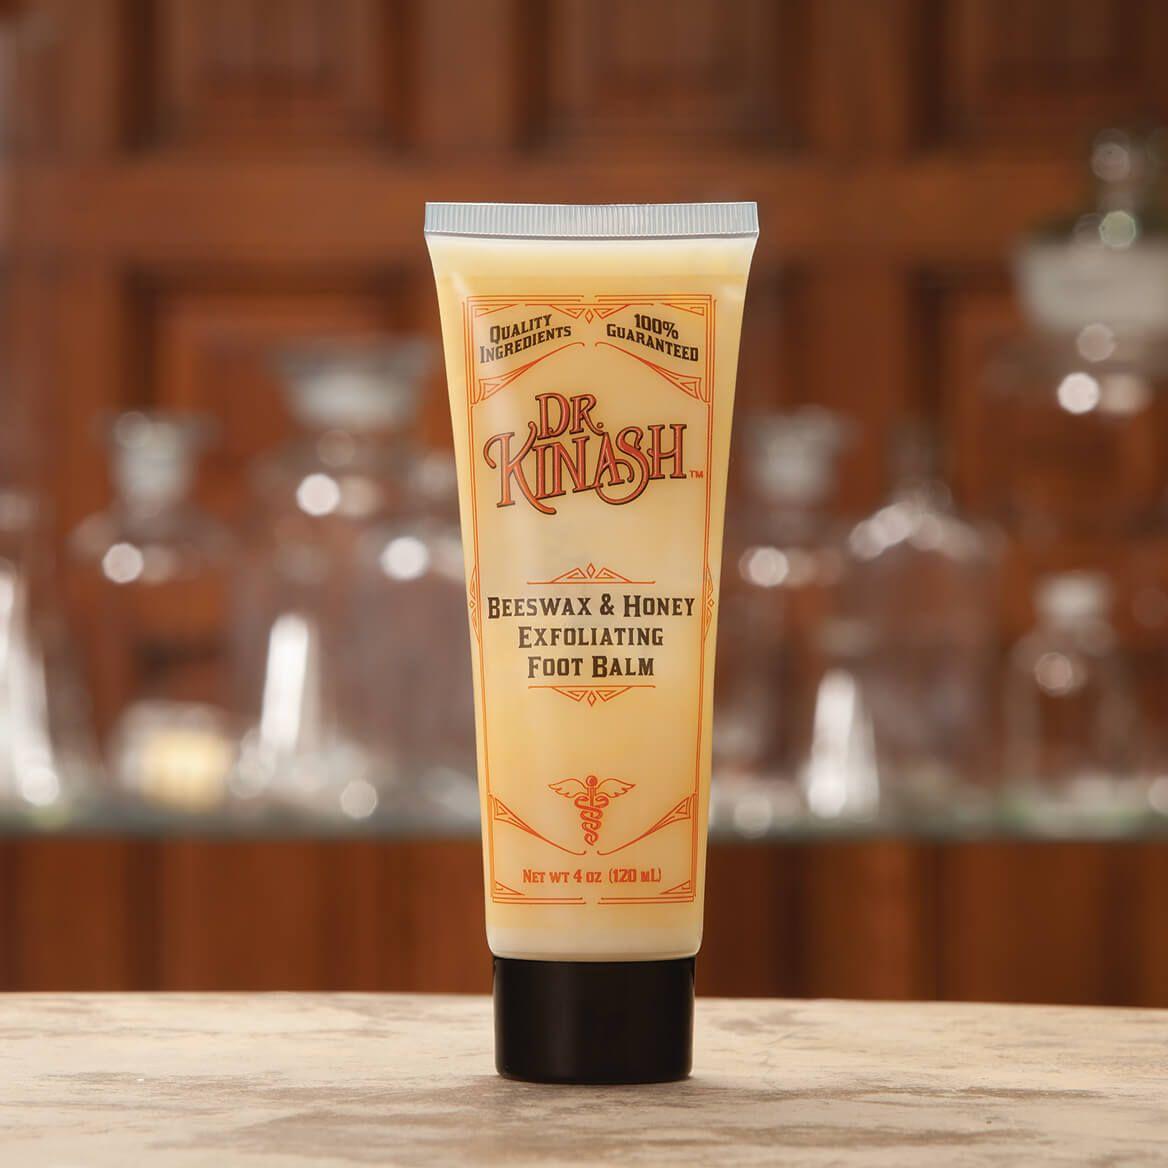 Dr. Kinash™ Beeswax & Honey Foot Balm 4 oz., Set of 2-368912